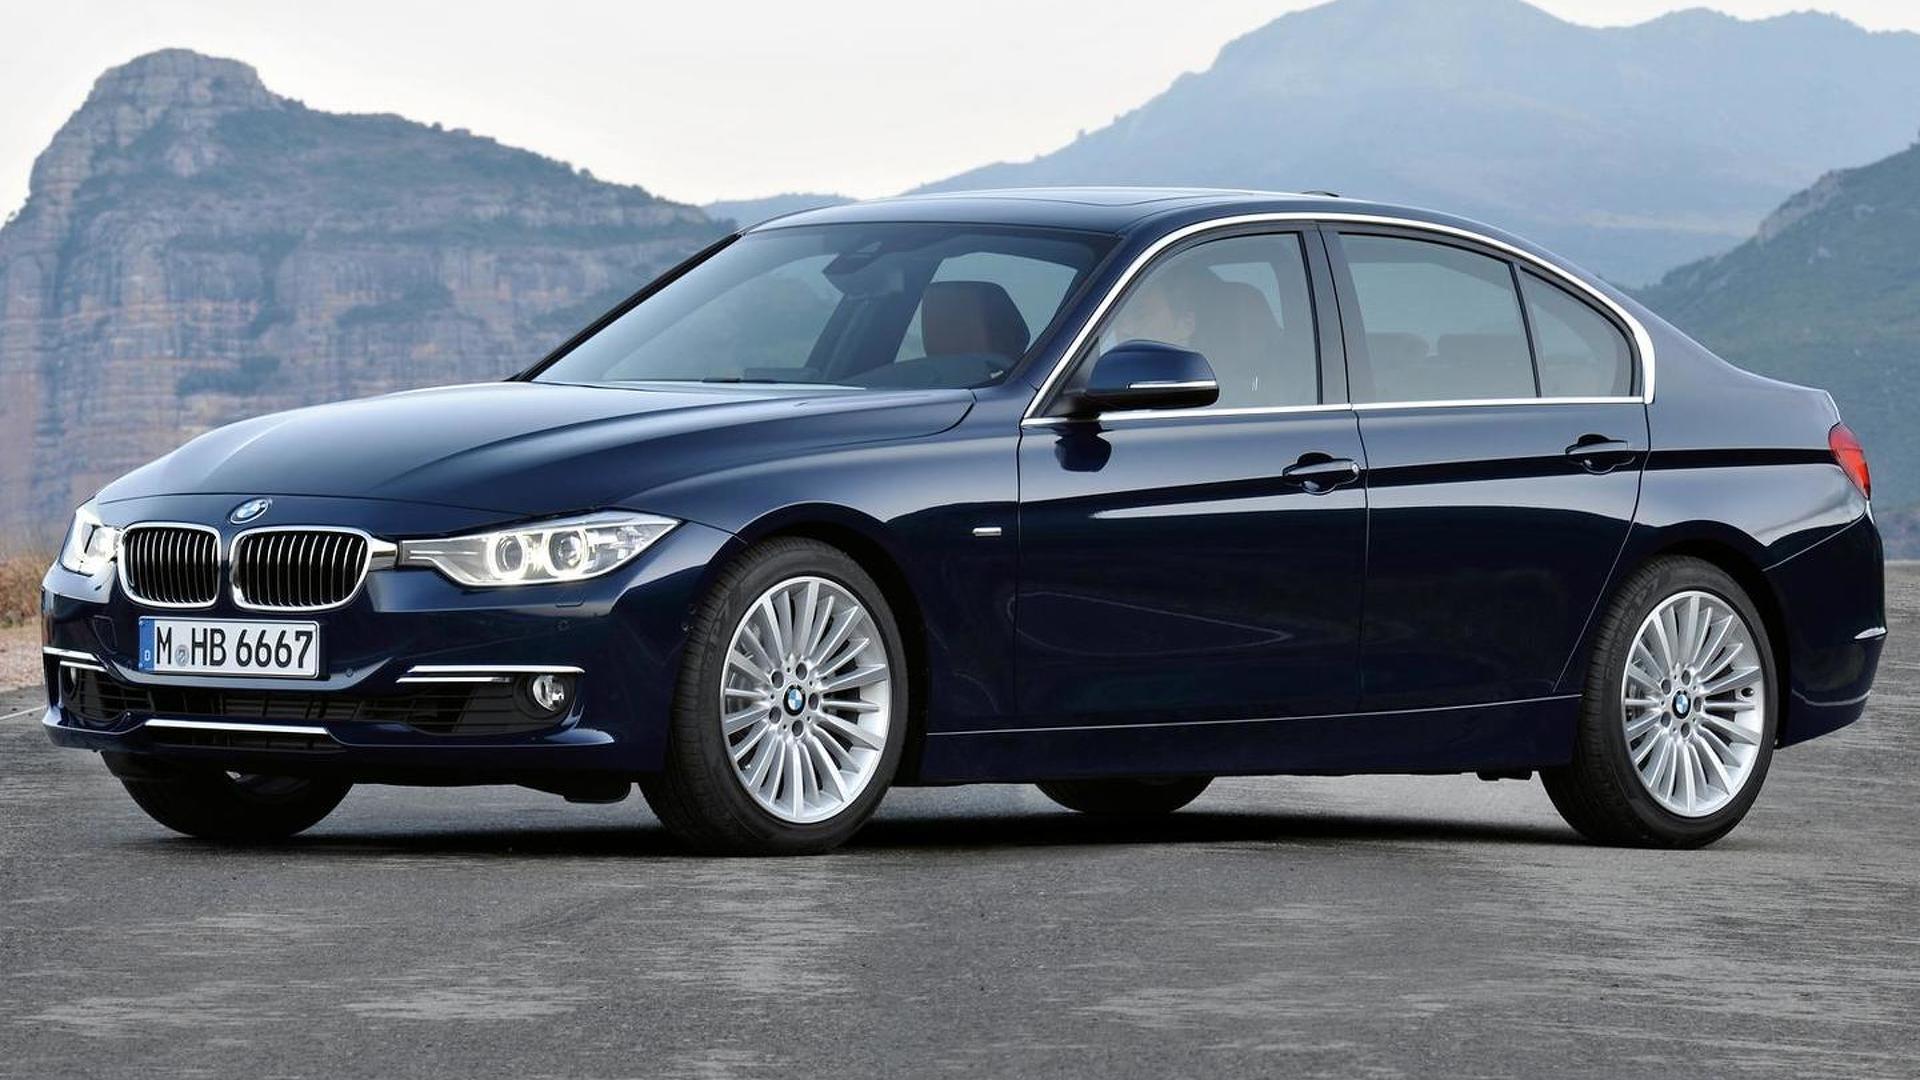 BMW I EfficientDynamics I Series XDrive Announced - 320i bmw 2012